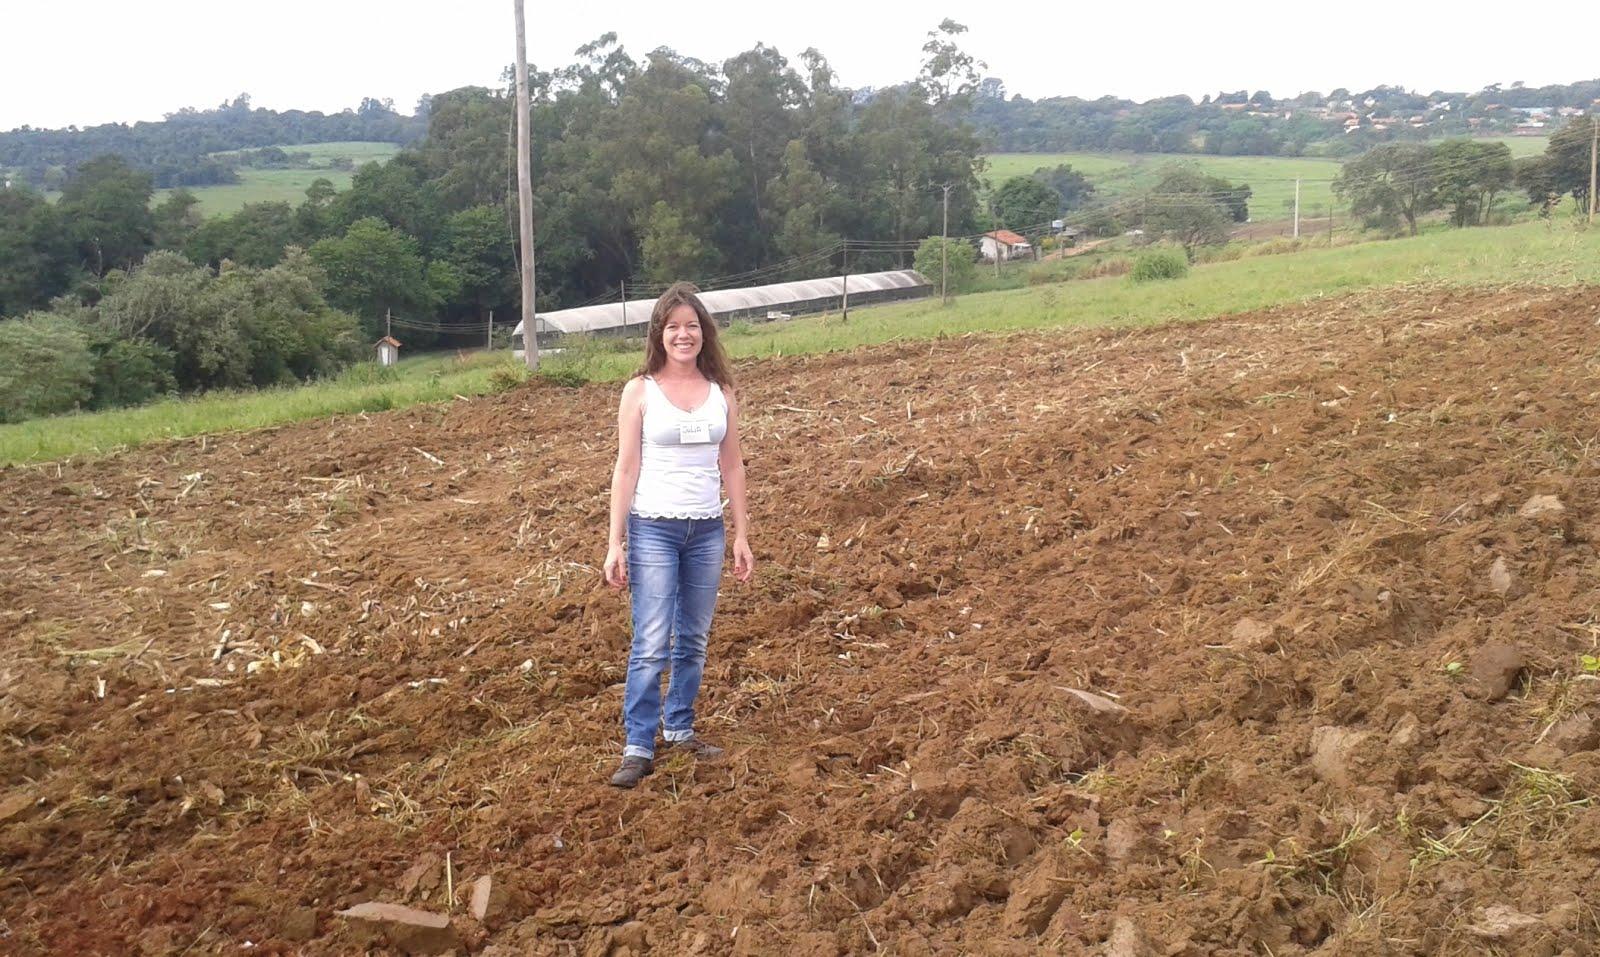 Curso de Agricultura Orgânica 2016